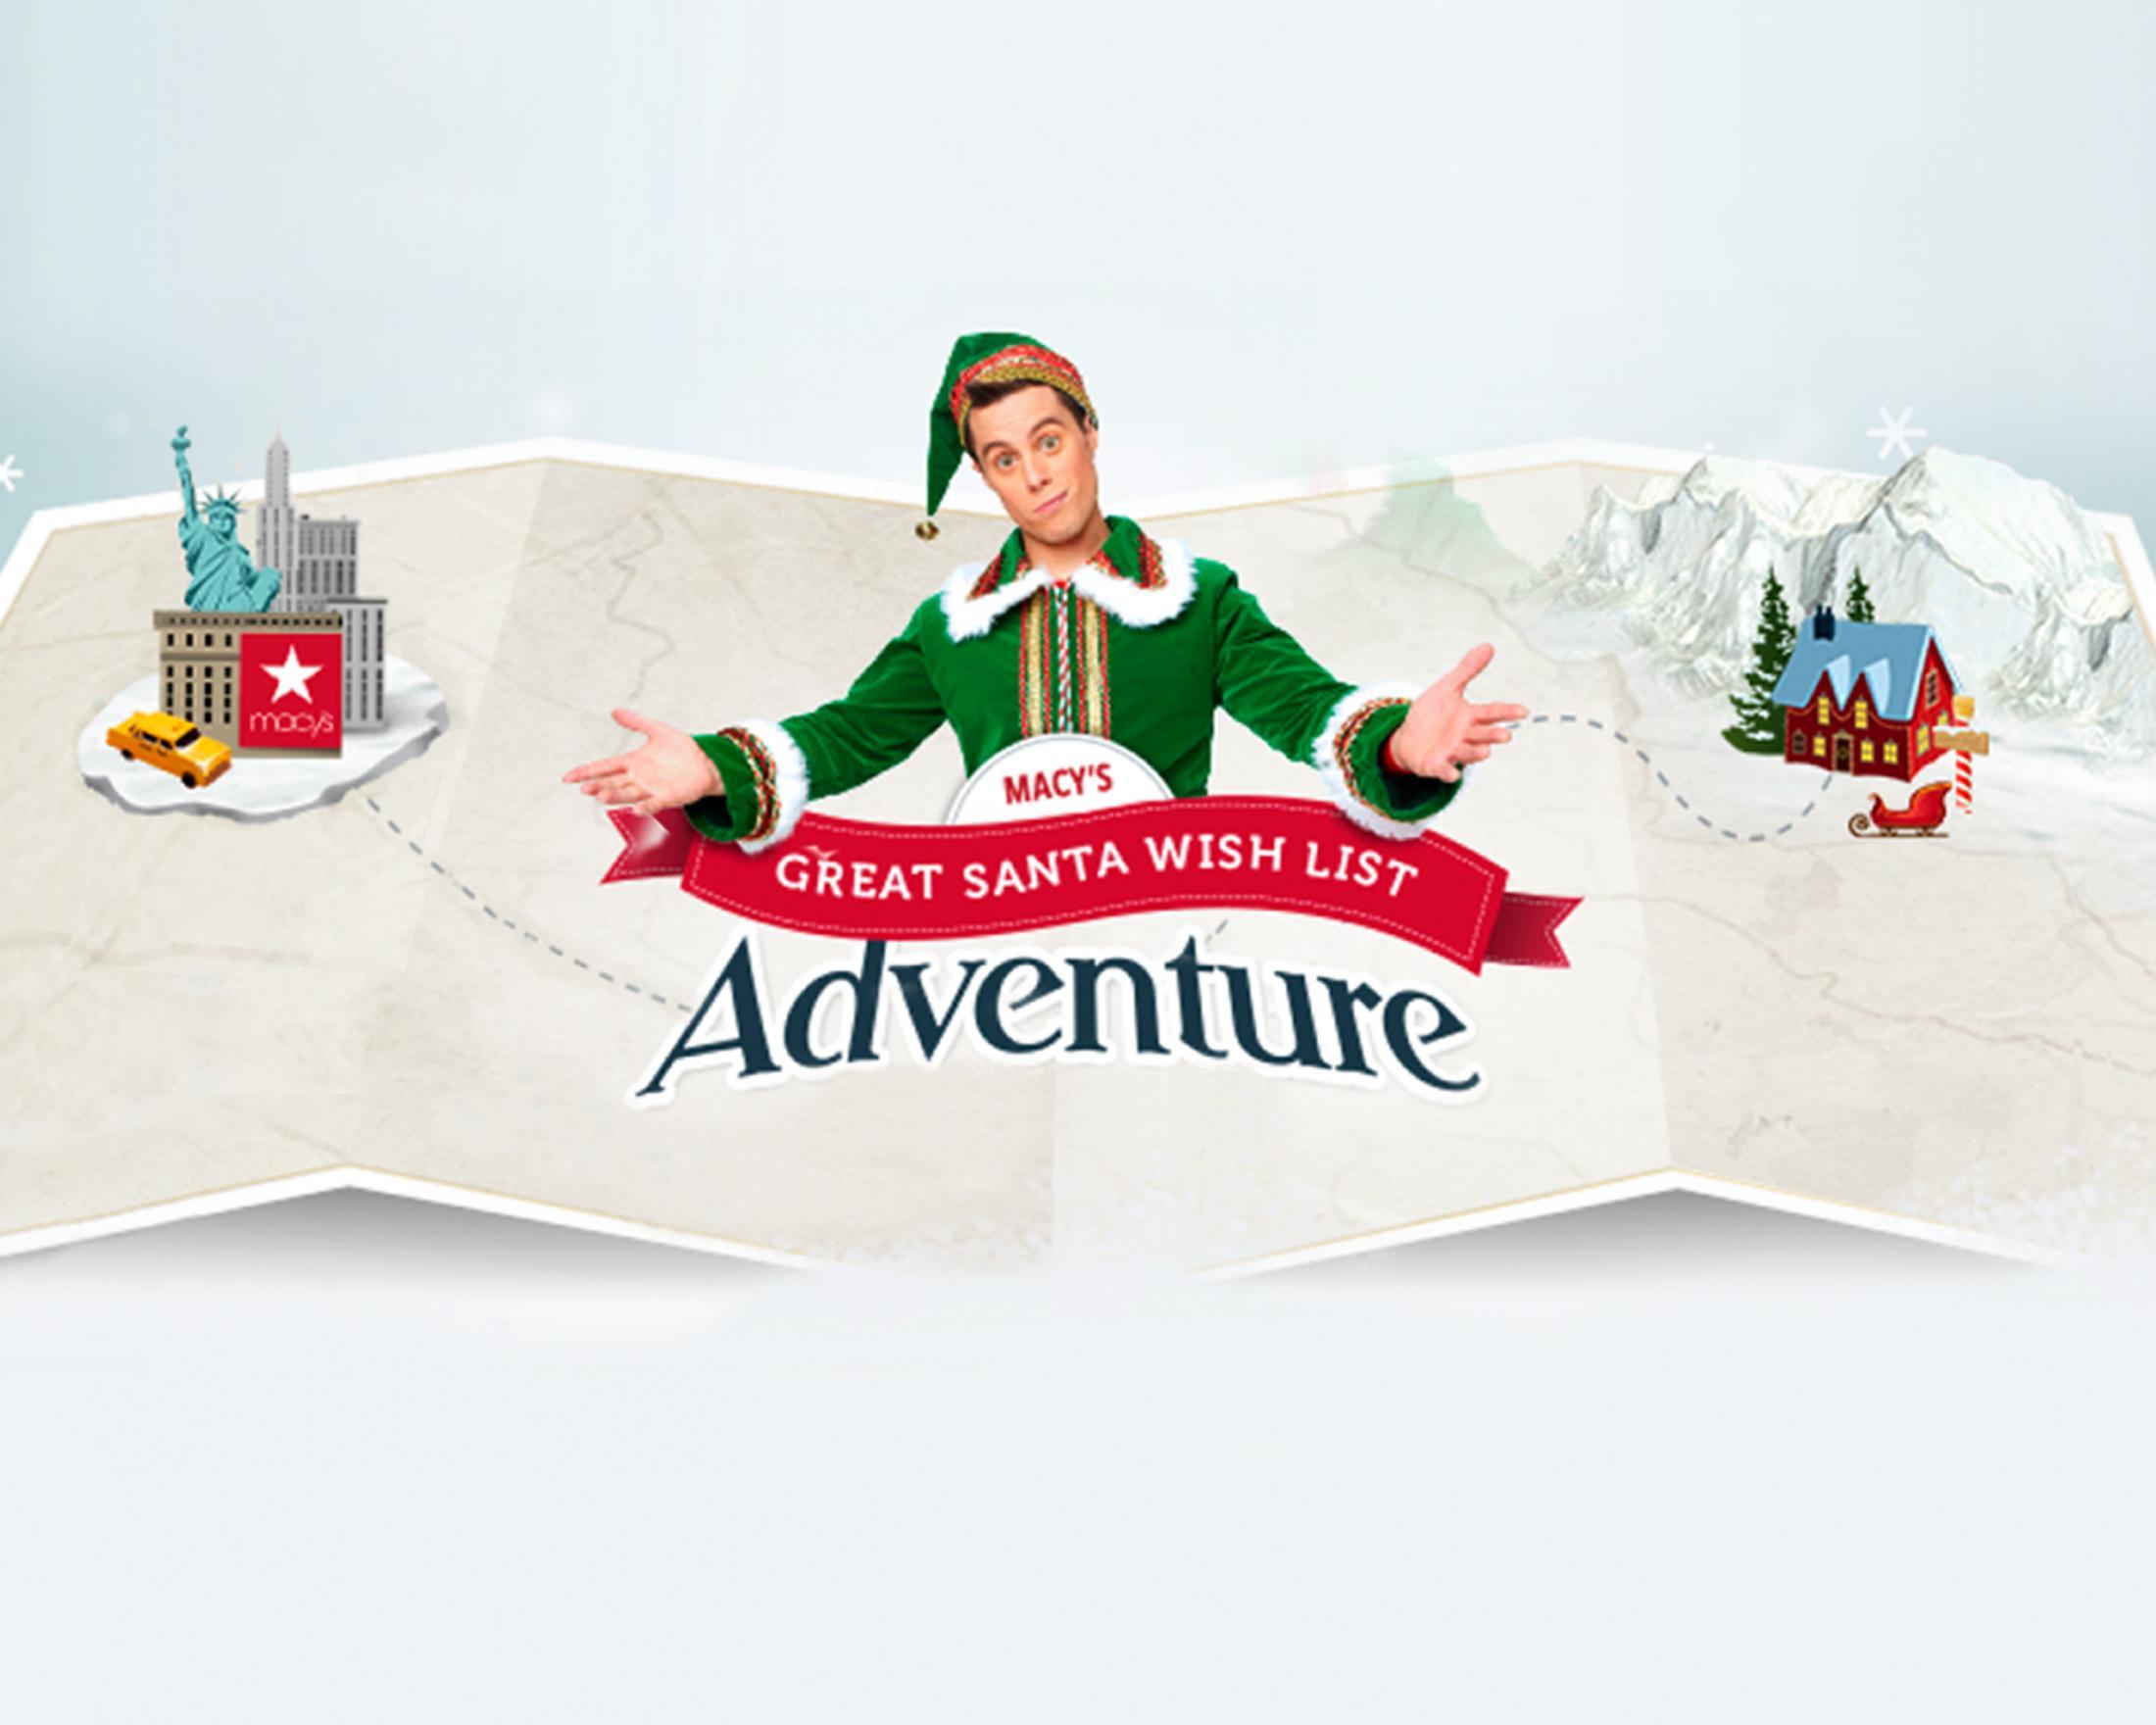 Thumbnail for Macy's Great Santa Wish List Adventure